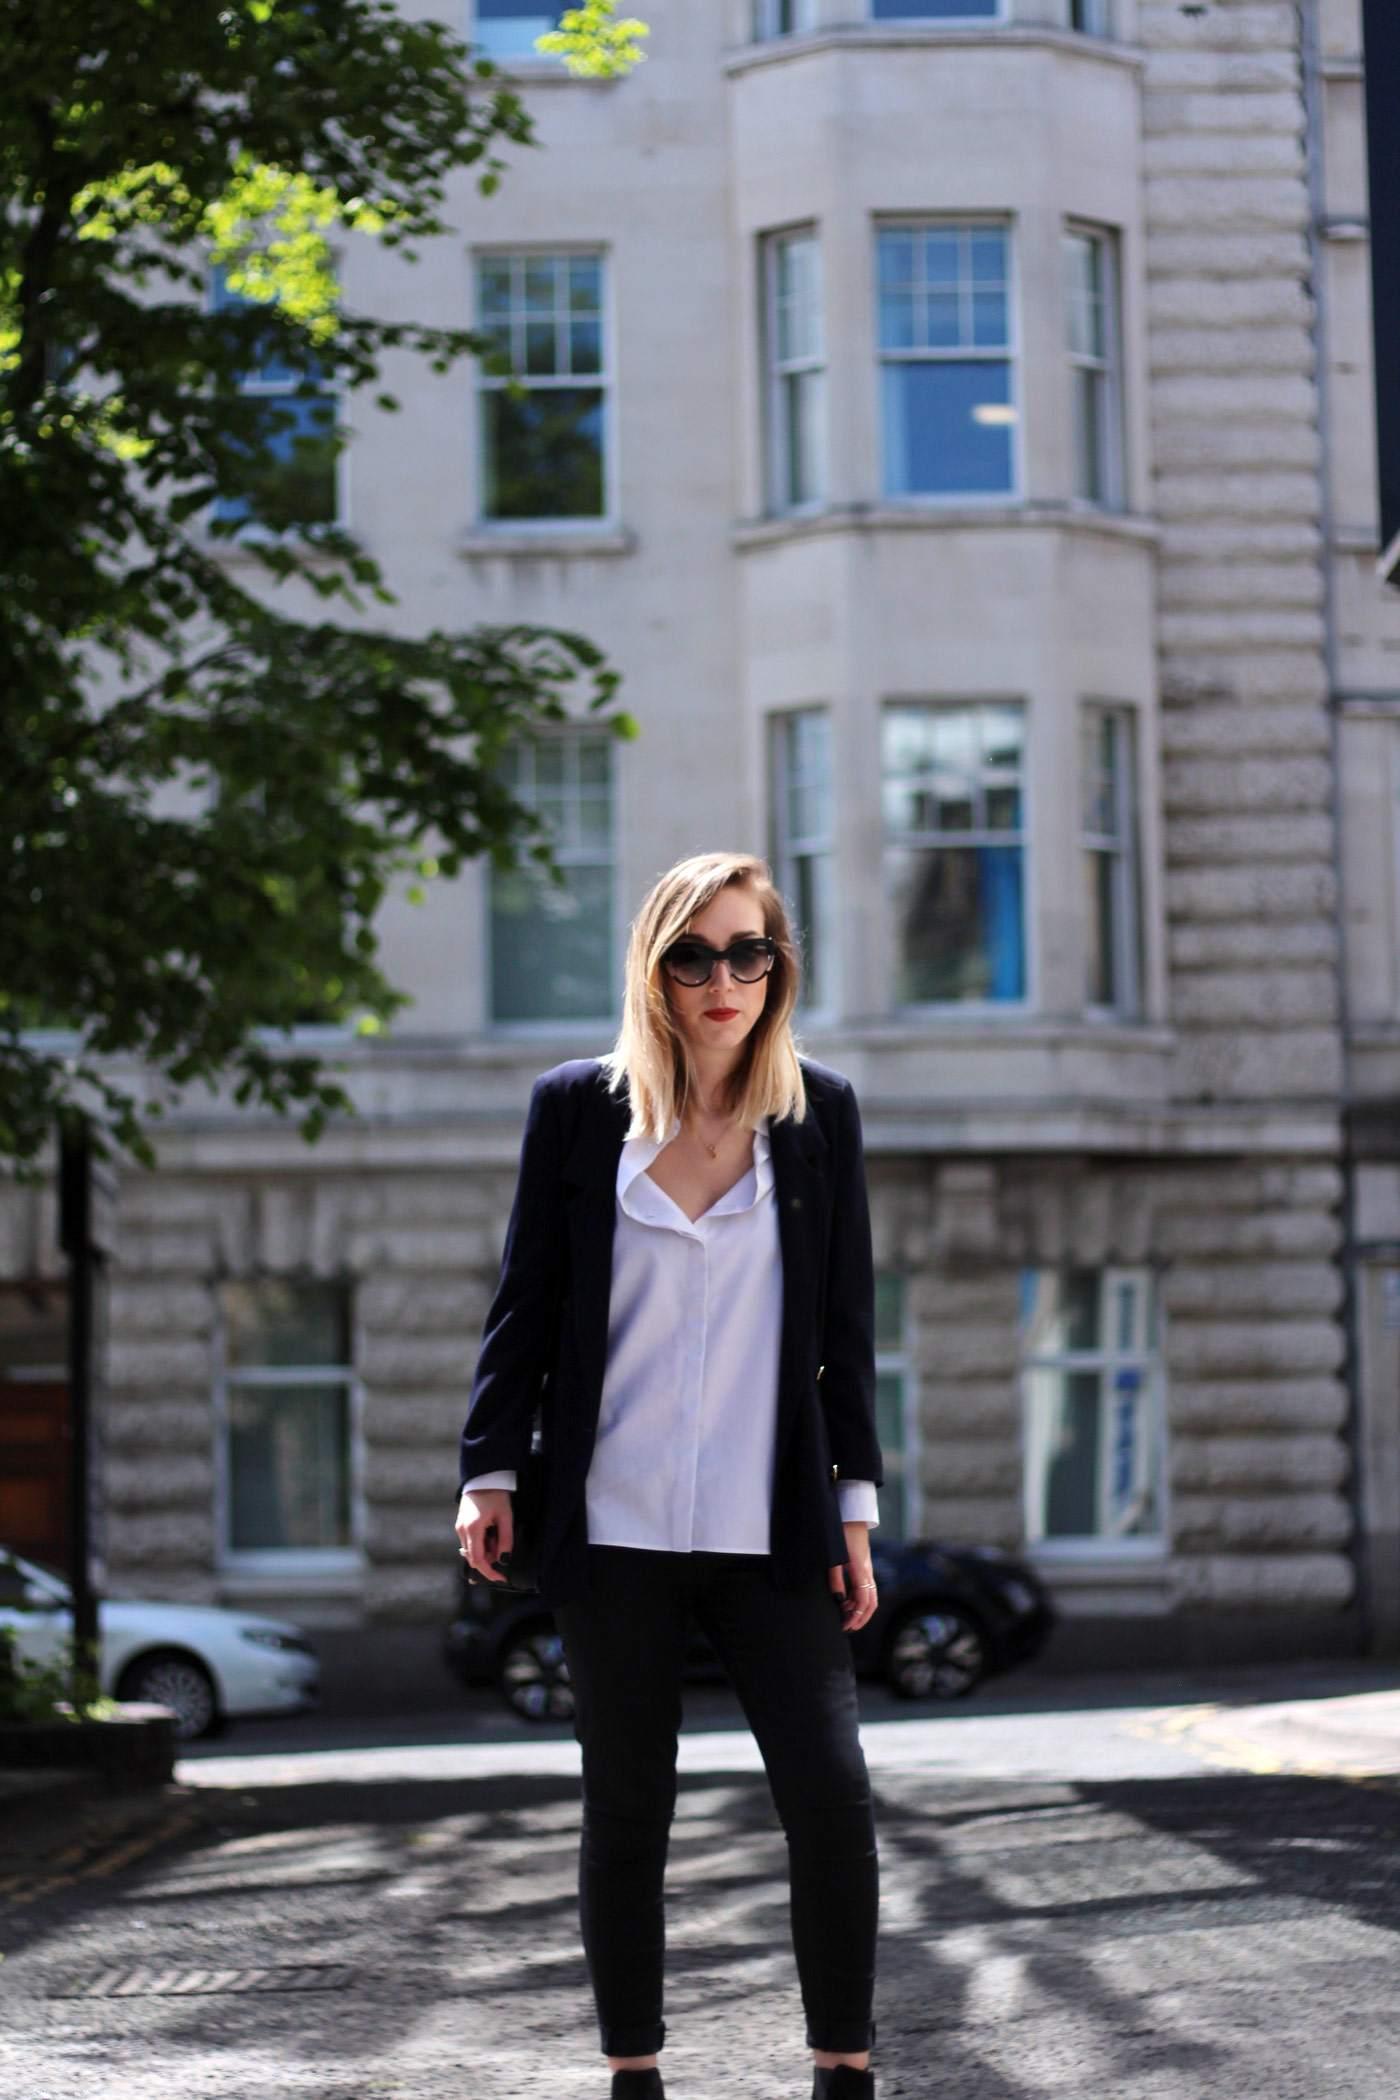 acne-jensen-boots-M&S-alexa-chung-ada-blazer-outfit-8